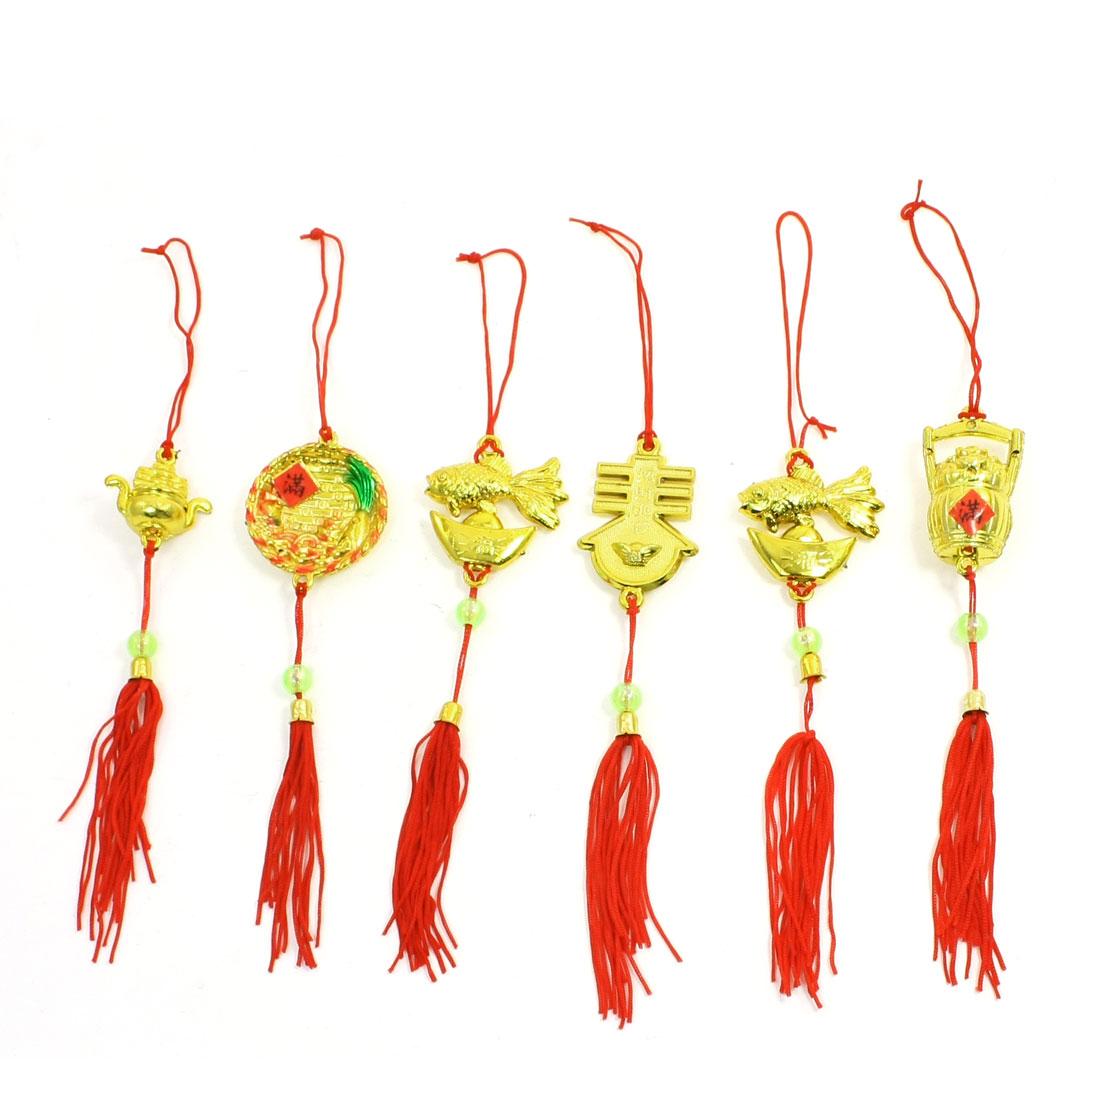 6 Pcs Red Tassel Gold Tone Classic Style Christmas Hanging Pendant Ornament